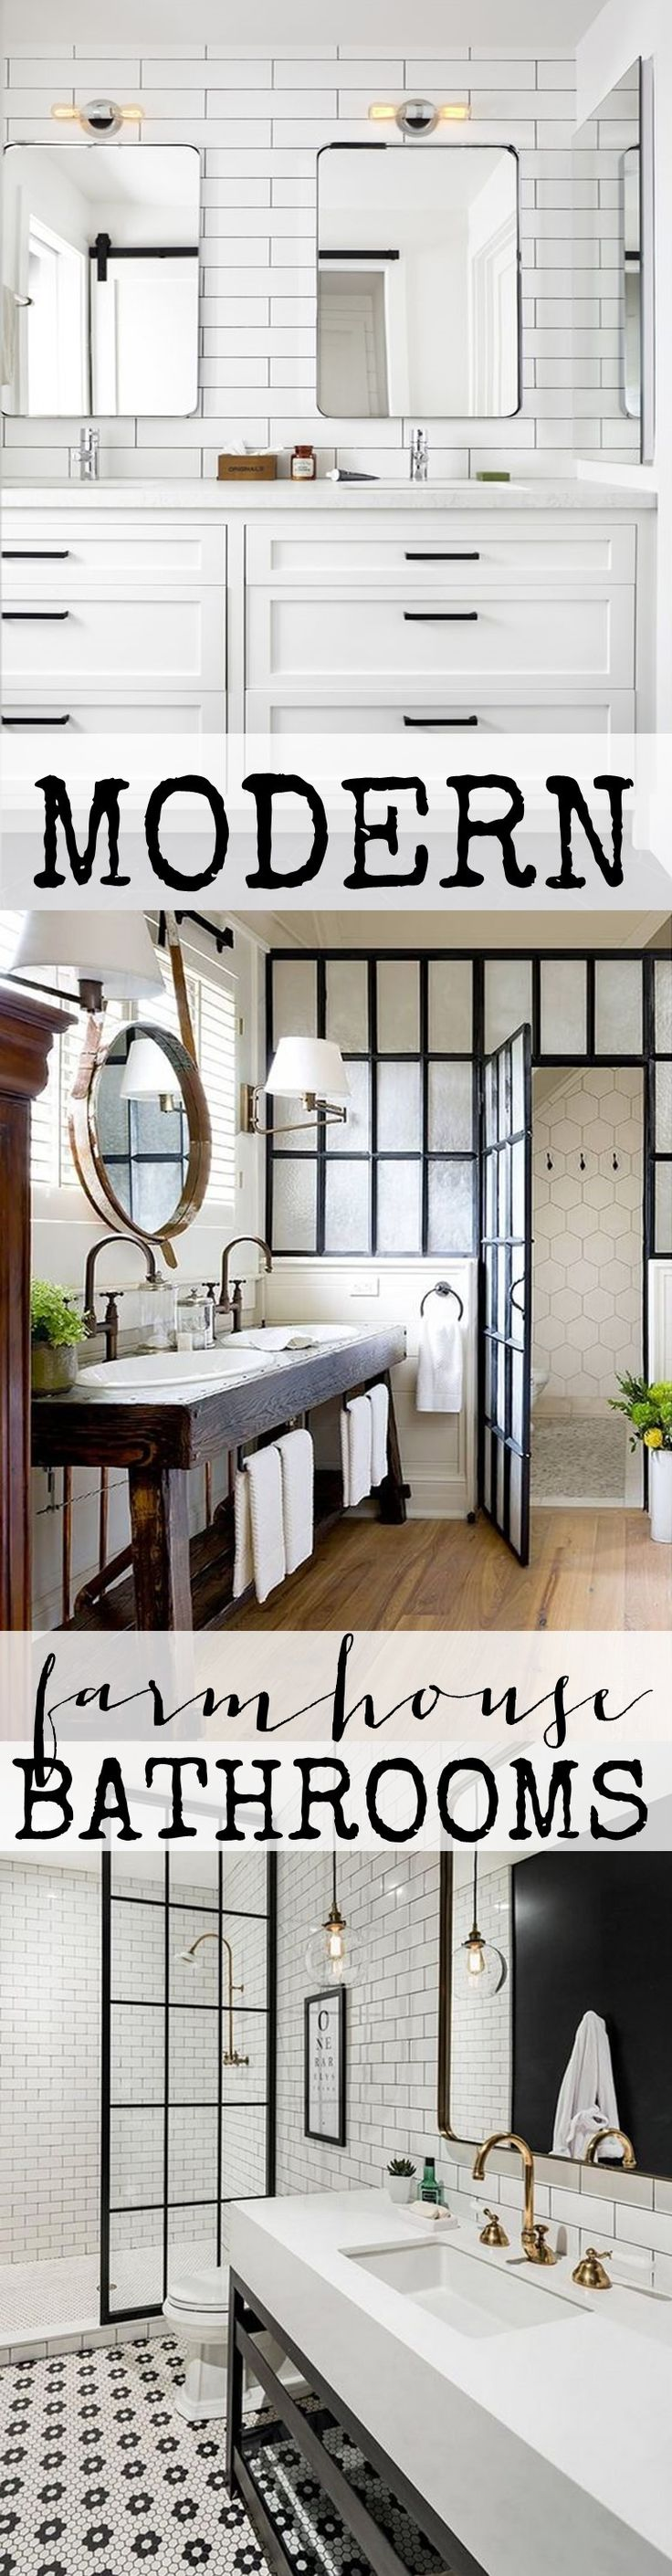 Best 25+ Modern farmhouse bathroom ideas on Pinterest | Modern ...